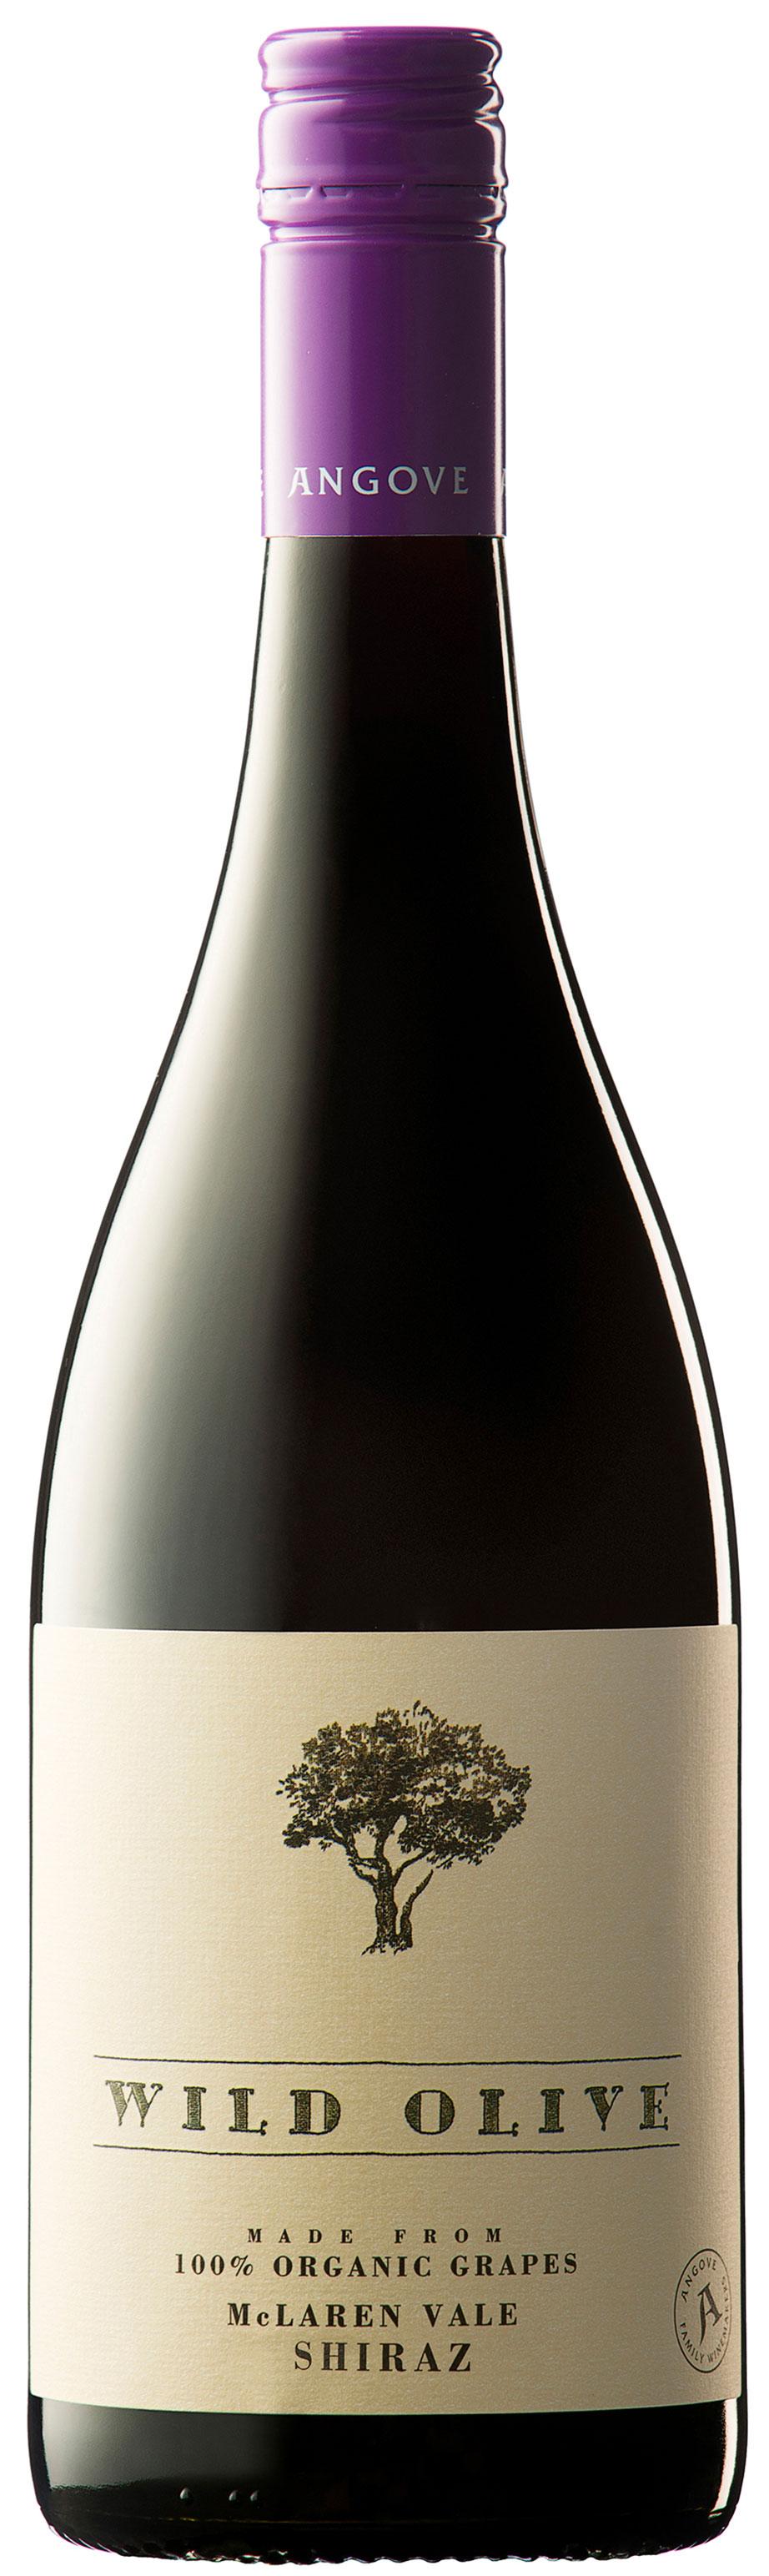 https://vinocorpperu.com/images/vinos/angove/wild_olive_shiraz_2017.jpg